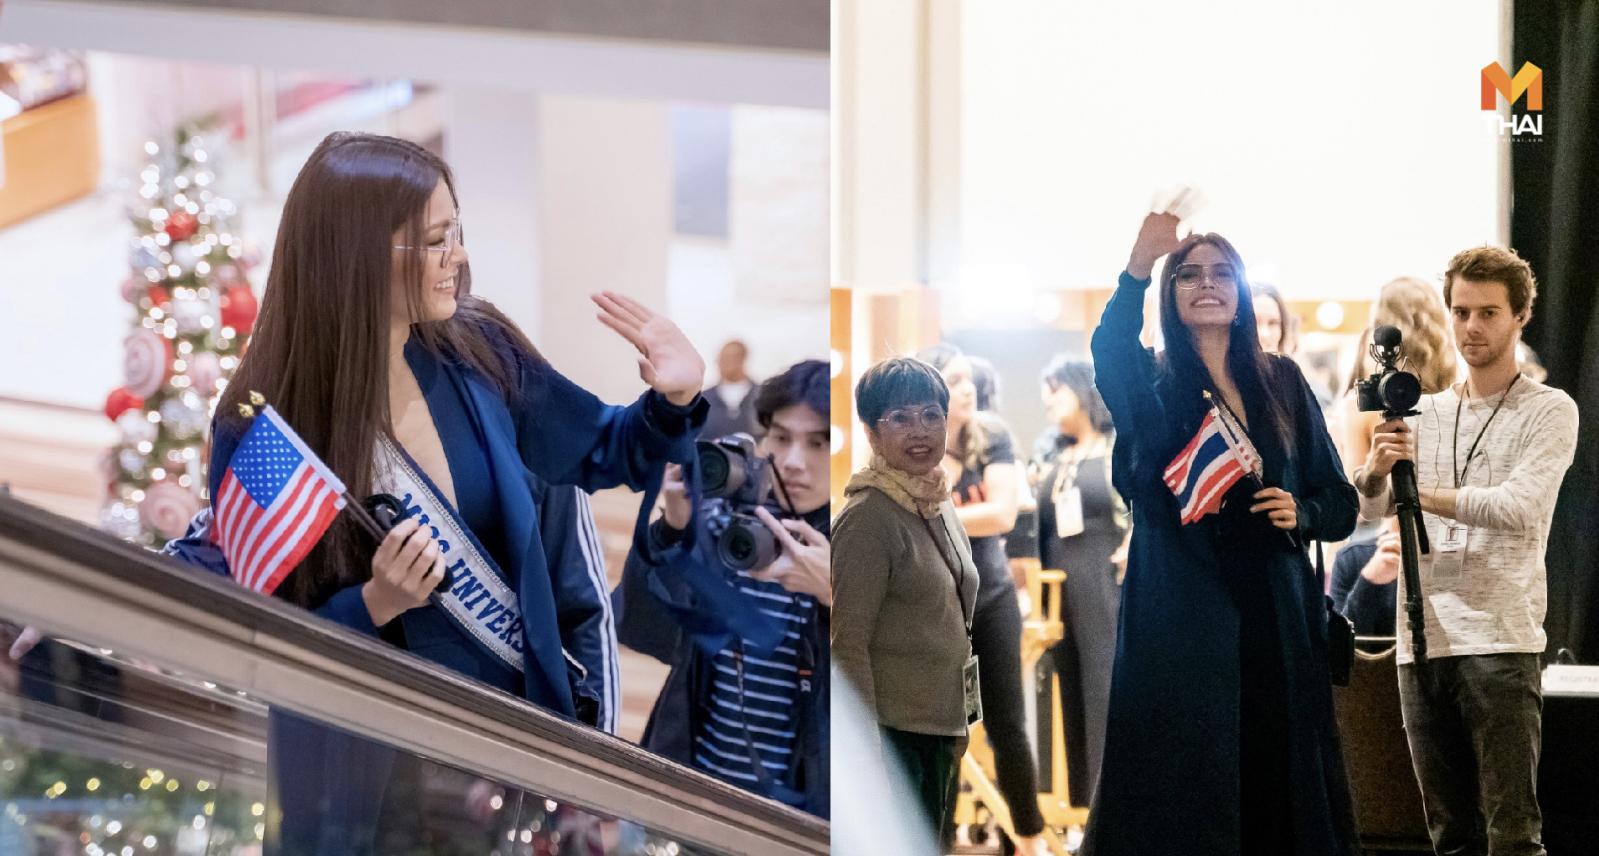 Miss Universe 2019 Miss Universe Thailand Miss Universe Thailand 2019 Miss-Universe ฟ้าใส ปวีณสุดา มิสยูนิเวิร์ส มิสยูนิเวิร์ส 2019 มิสยูนิเวิร์สไทยแลนด์ มิสยูนิเวิร์สไทยแลนด์ 2019